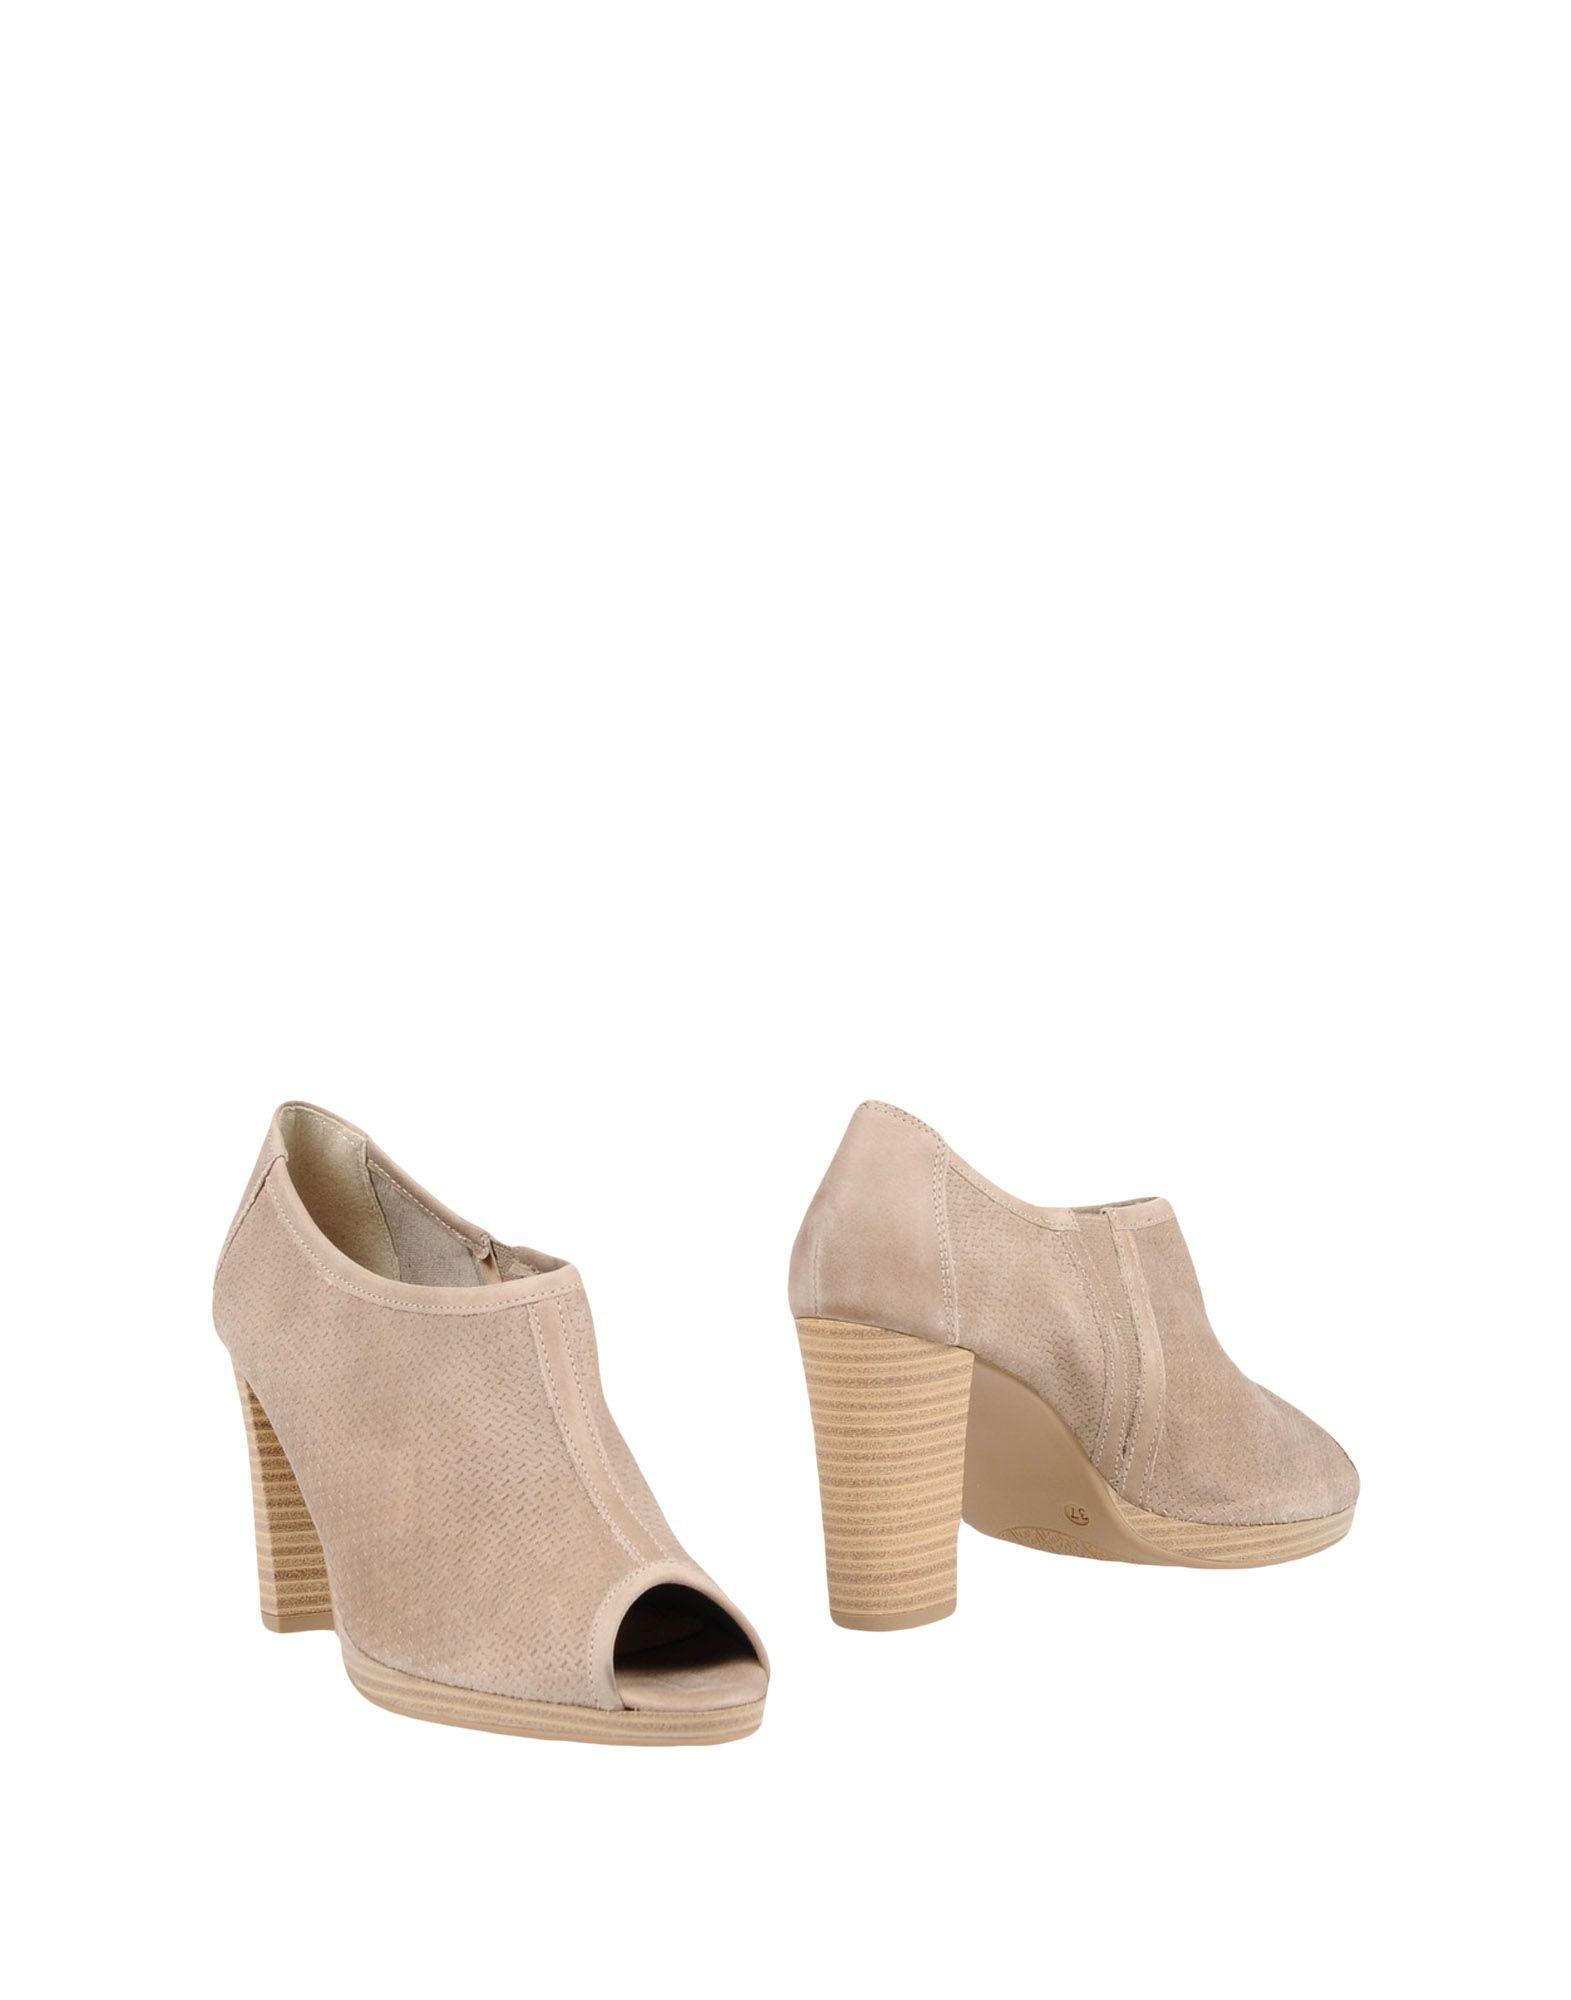 Chaussures - Sandales Pelledoca e401sso